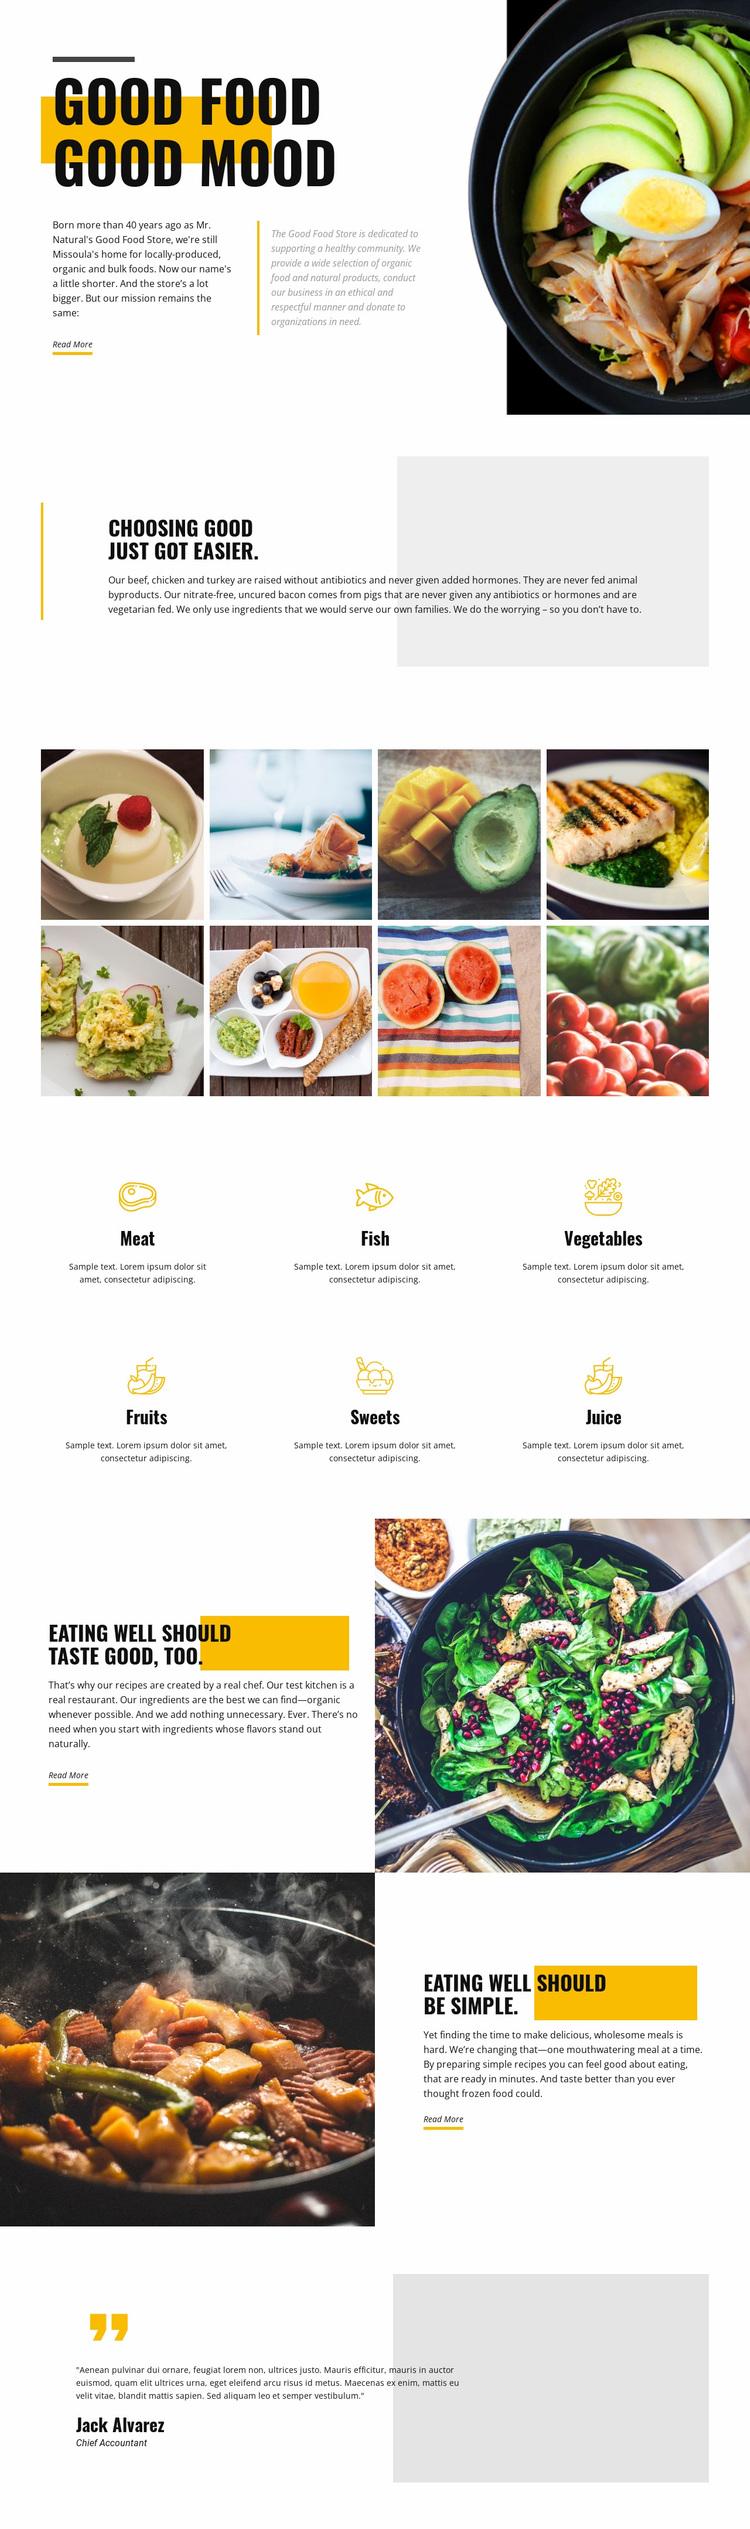 Good mood good food Website Design